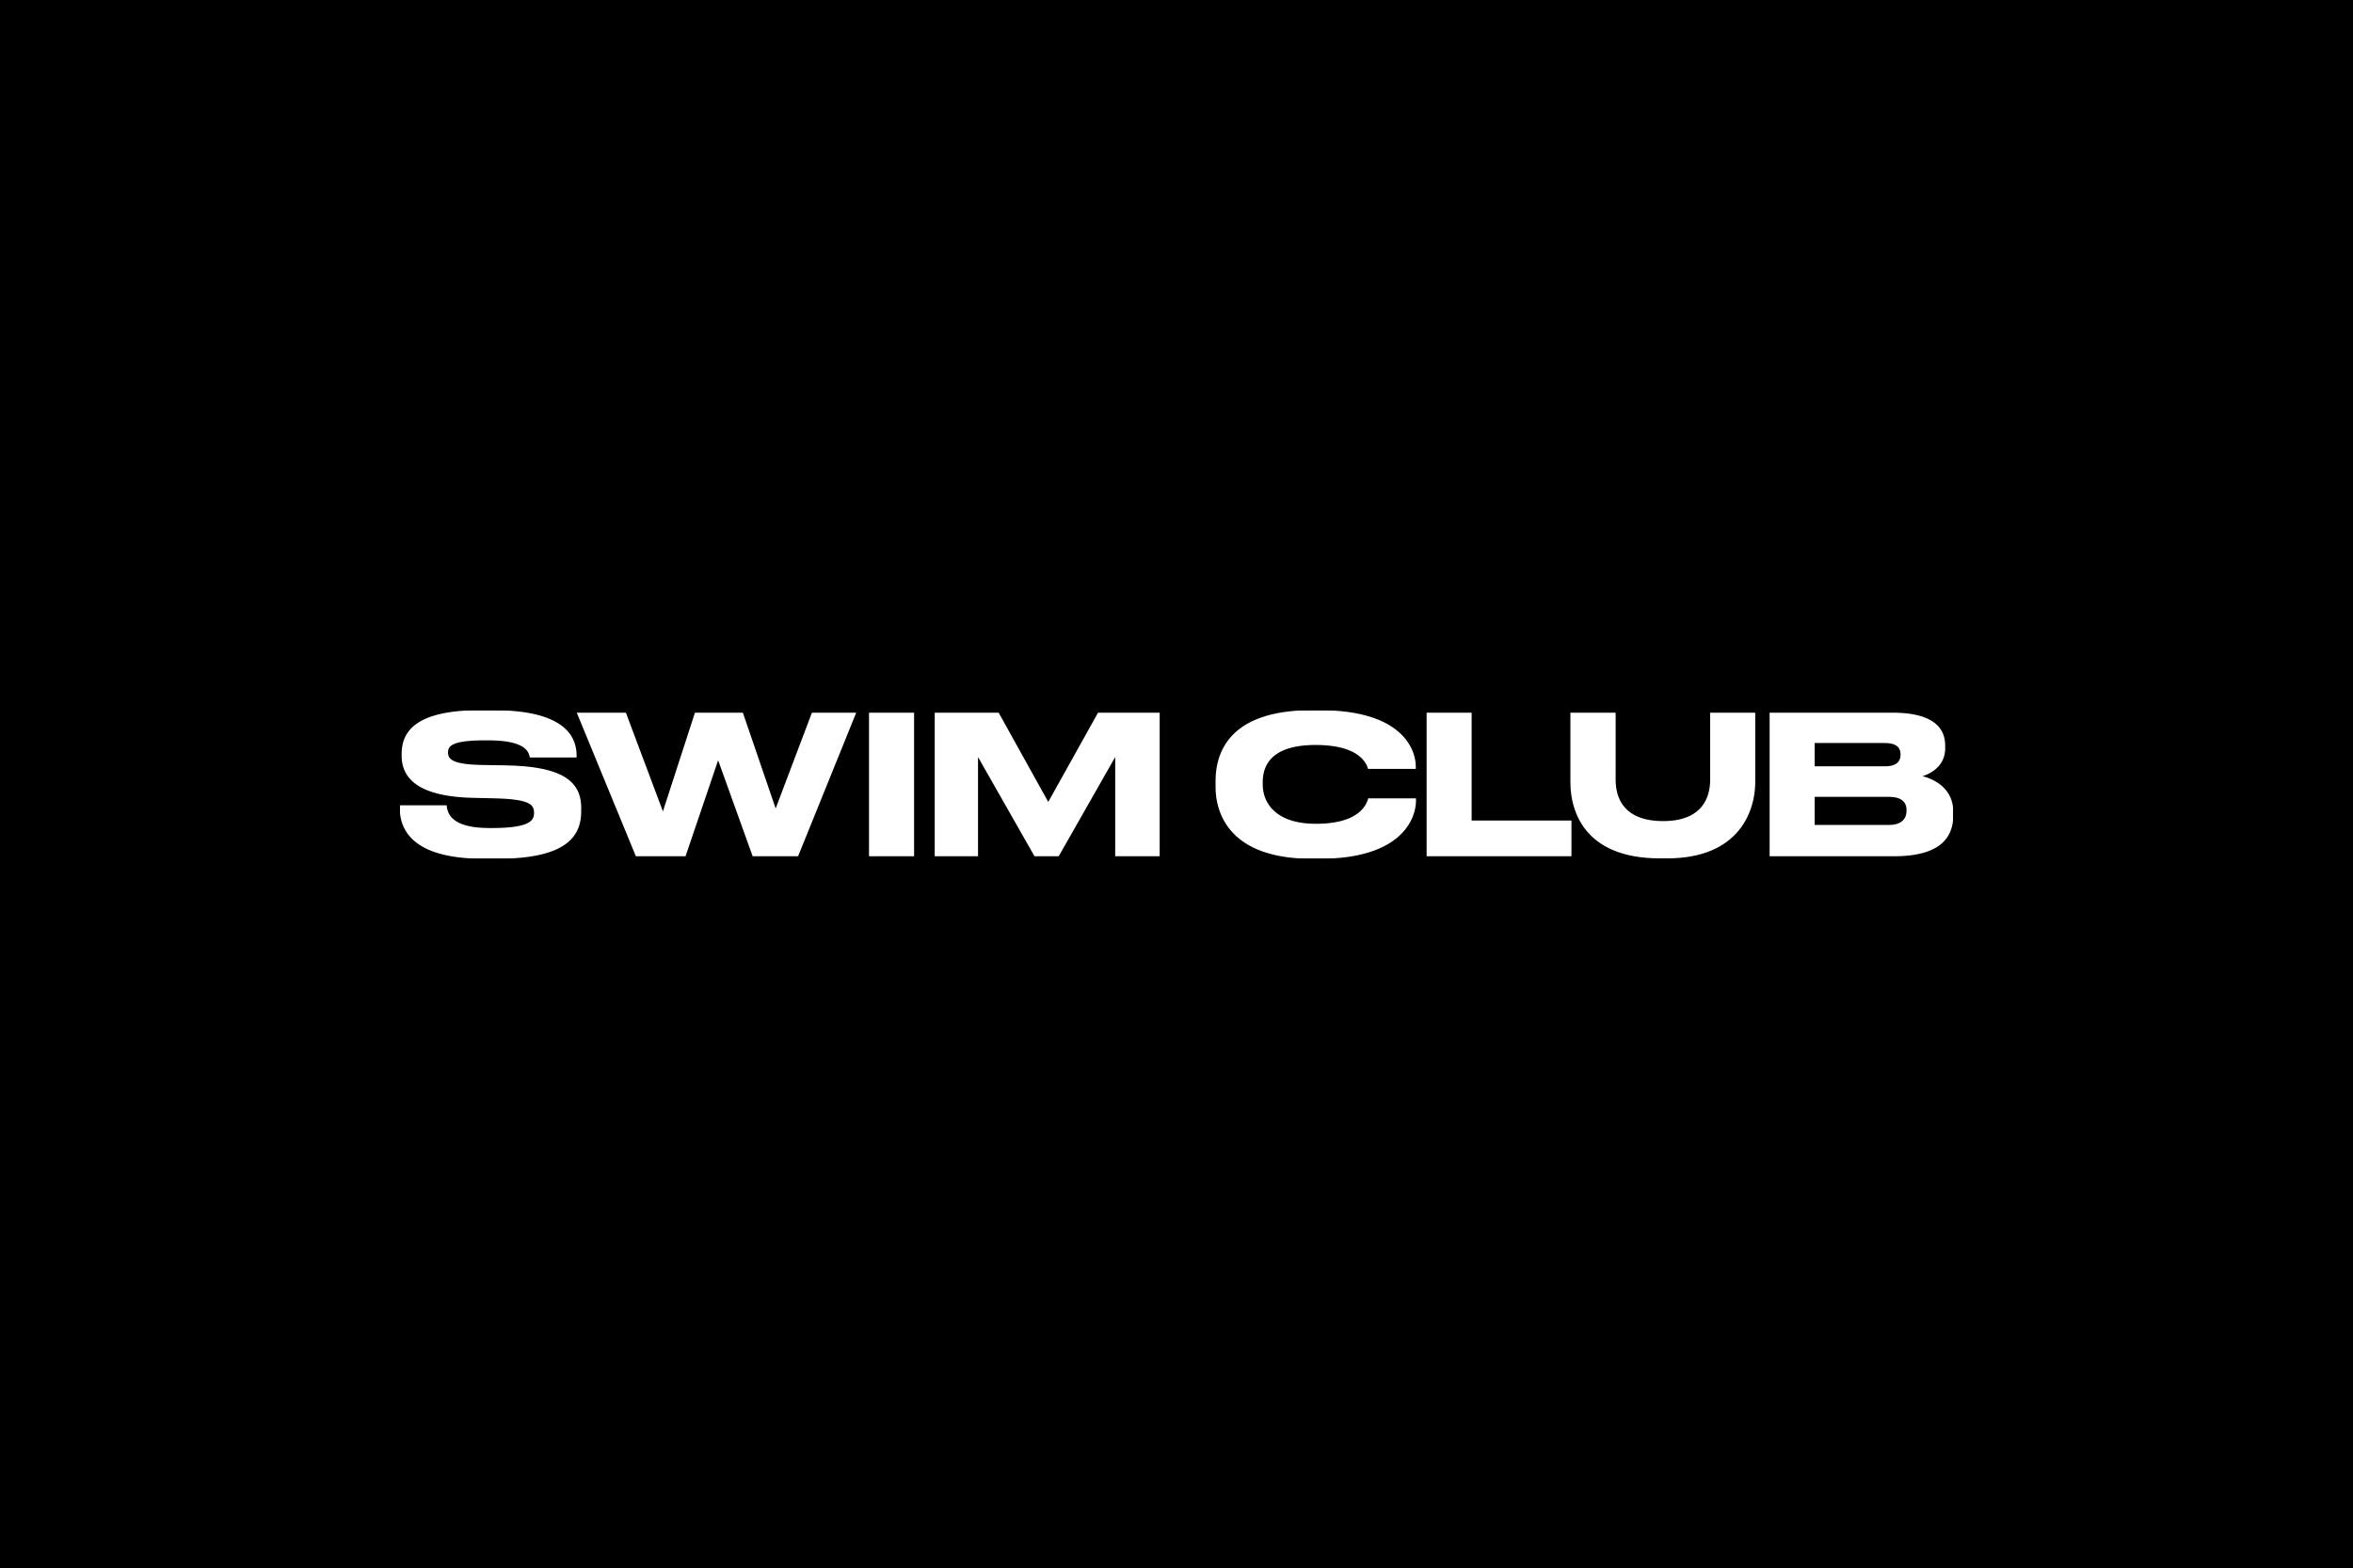 swimclub_logo_lrg.jpg